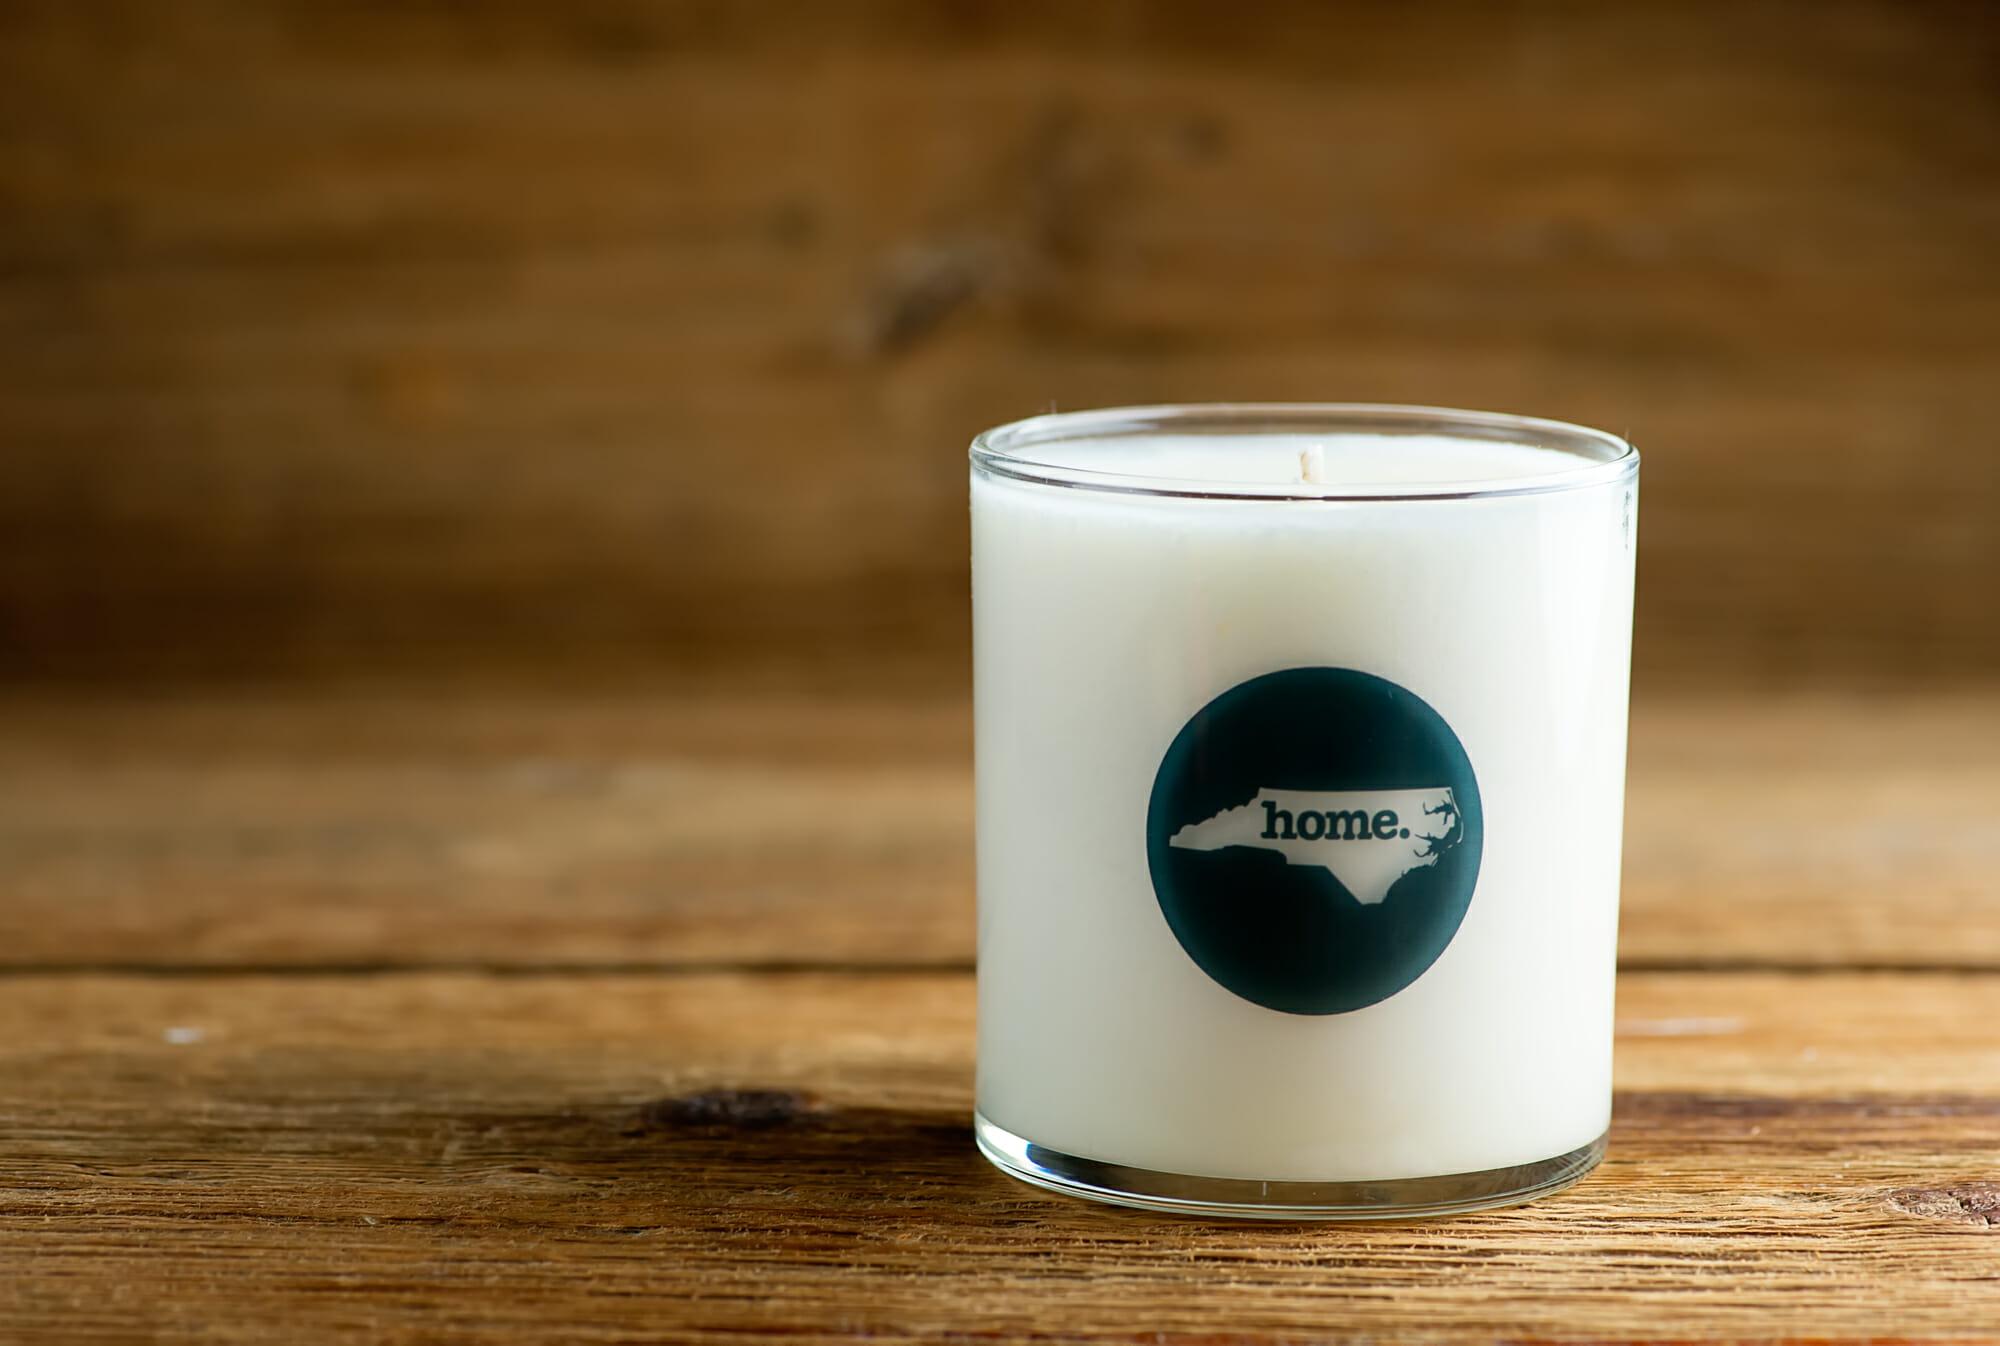 candle with North Carolina image